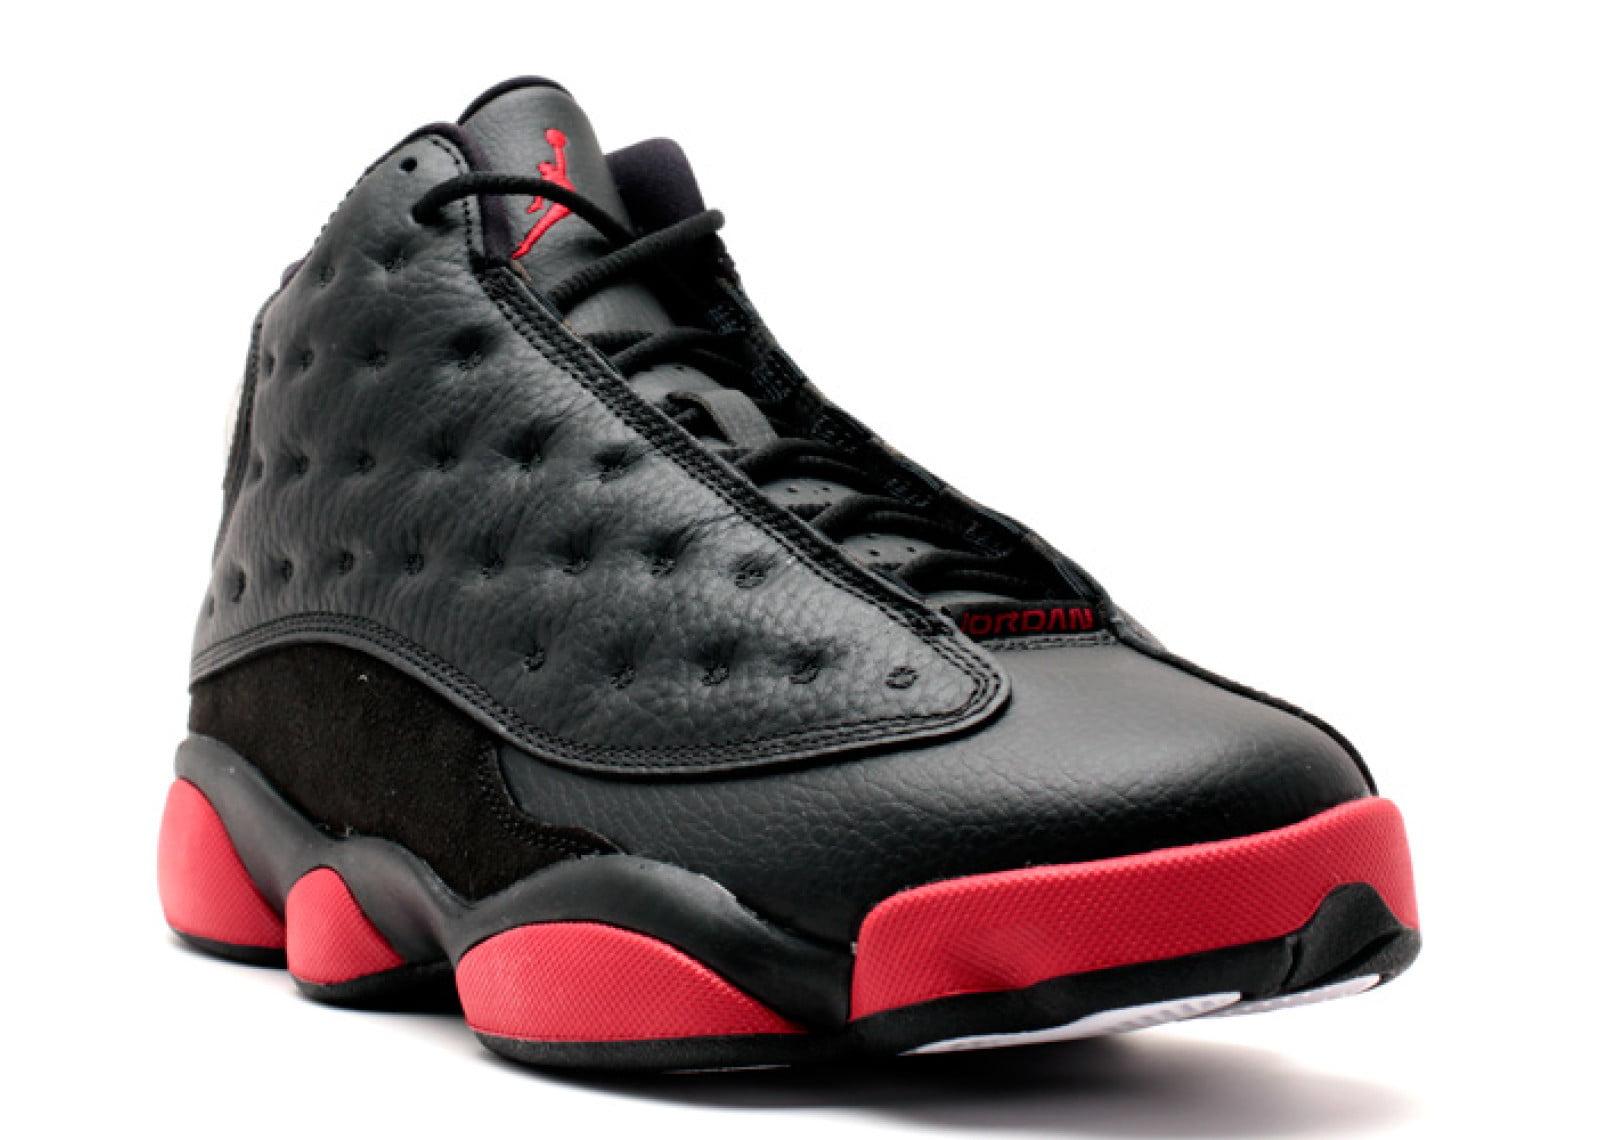 93ad06645a2c Air Jordan - Men - Air Jordan 13 Retro  Dirty Bred  - 414571-003 - Size 7.5